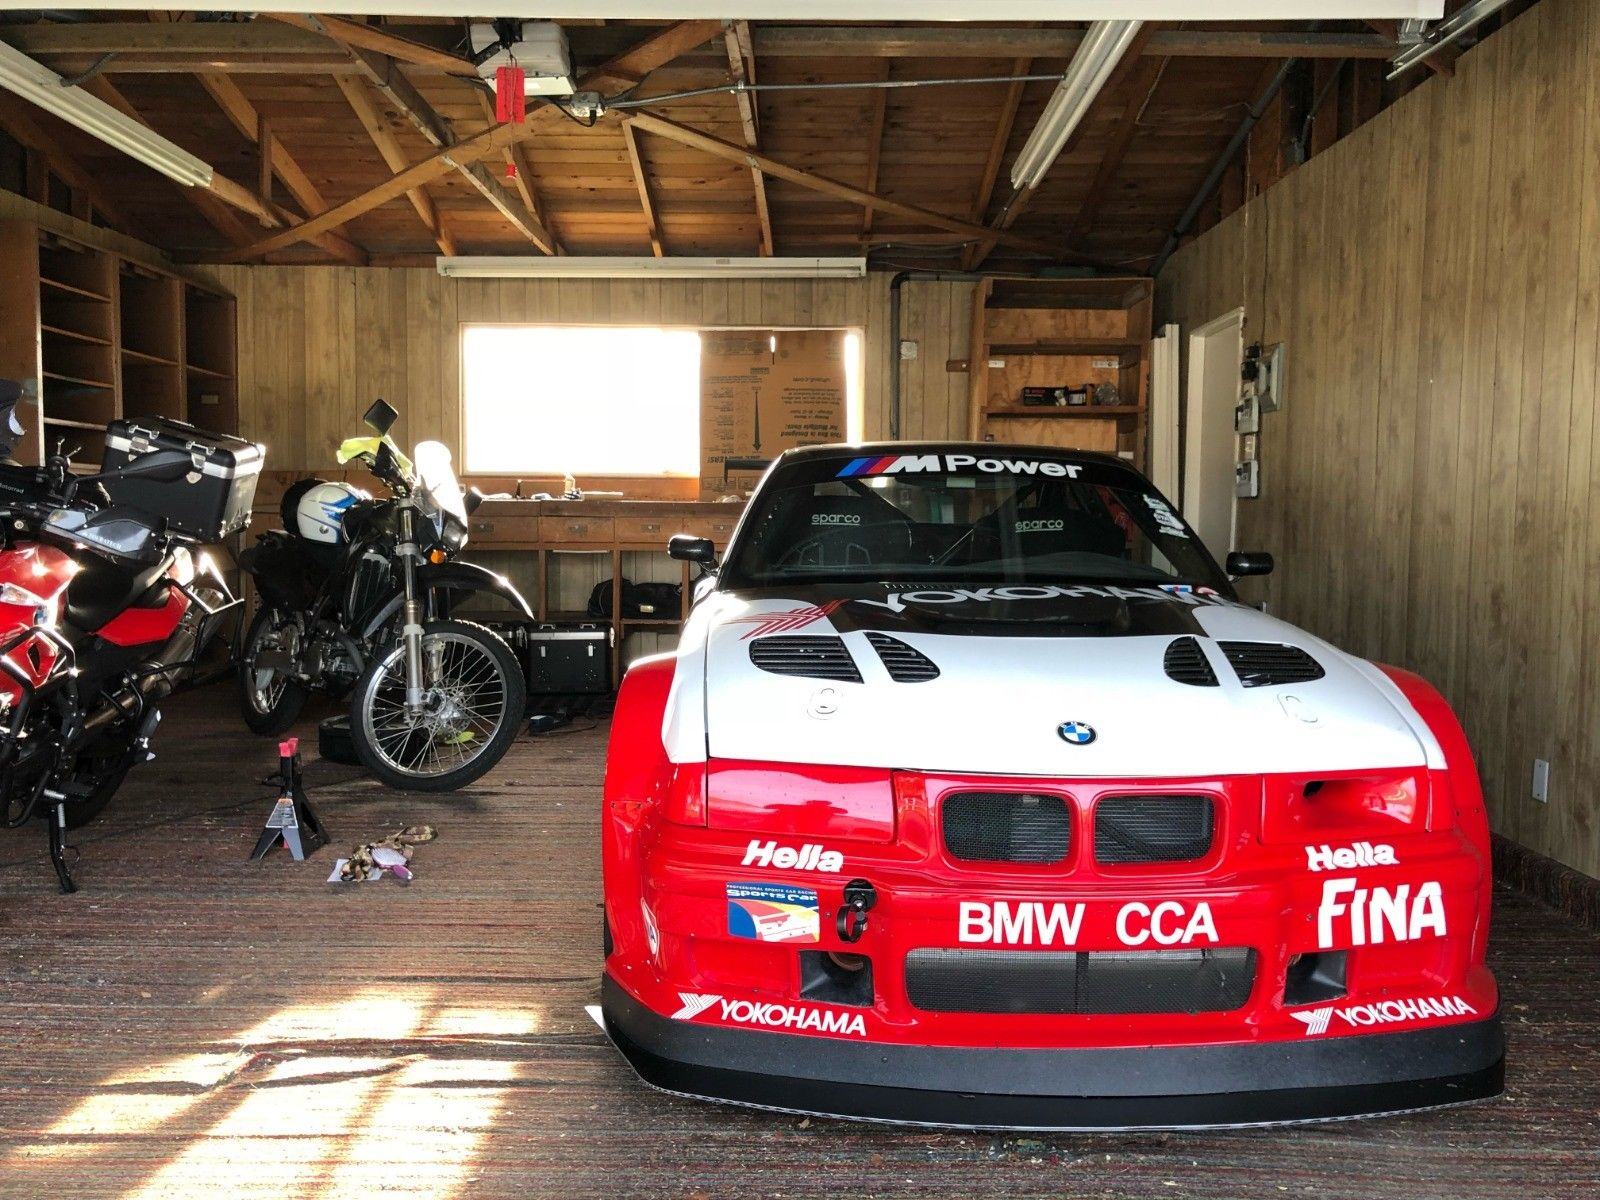 For Sale: BMW E36 Race Car with a S54 Inline-Six – Engine ... on bmw e36 with small tires, bmw street car custom, bmw e36 racing, bmw imsa, bmw e36 wheels,